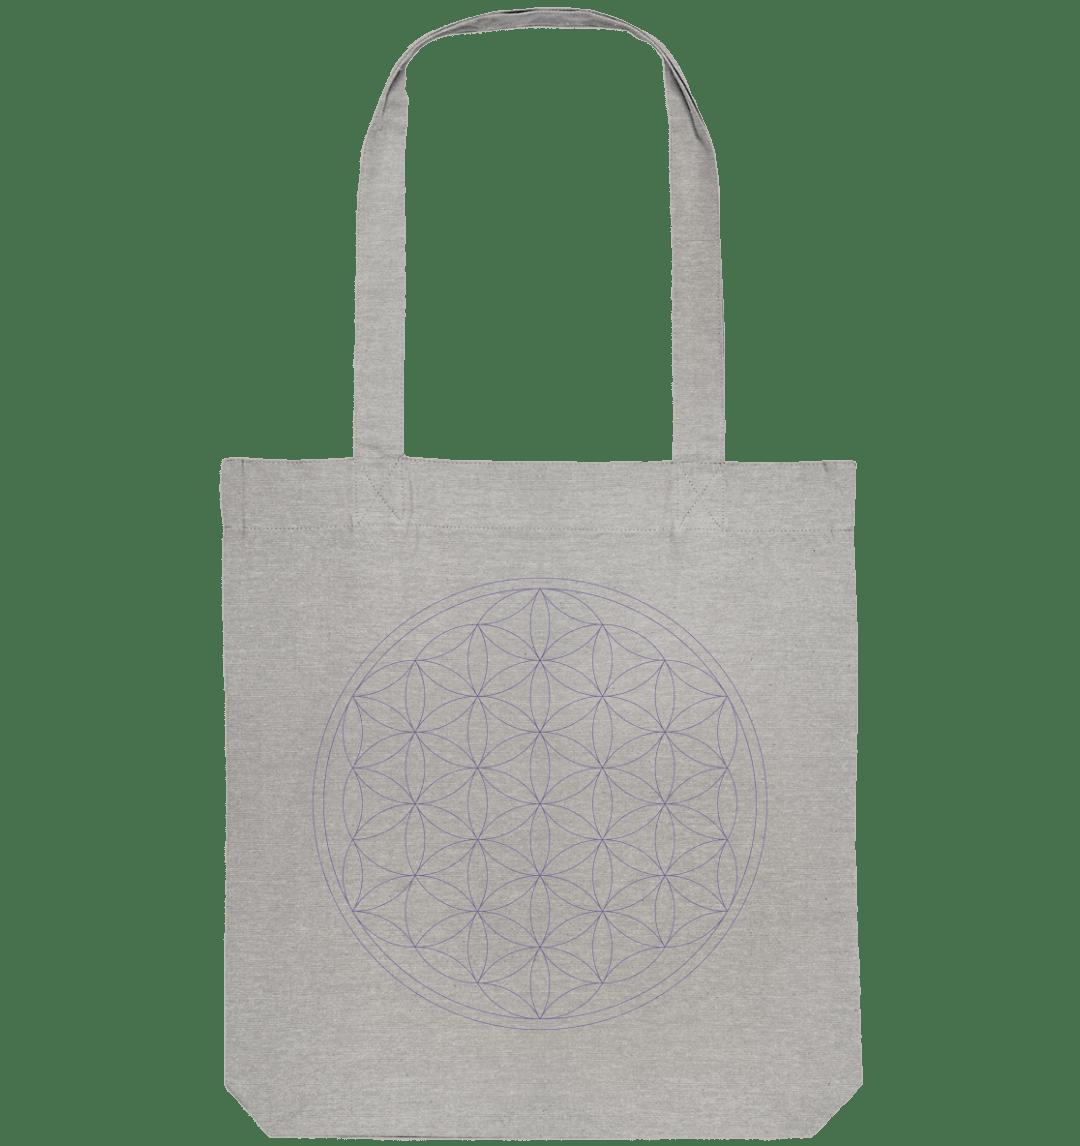 front organic tote bag c2c1c0 Blume des Lebens - Organic Tote-Bag